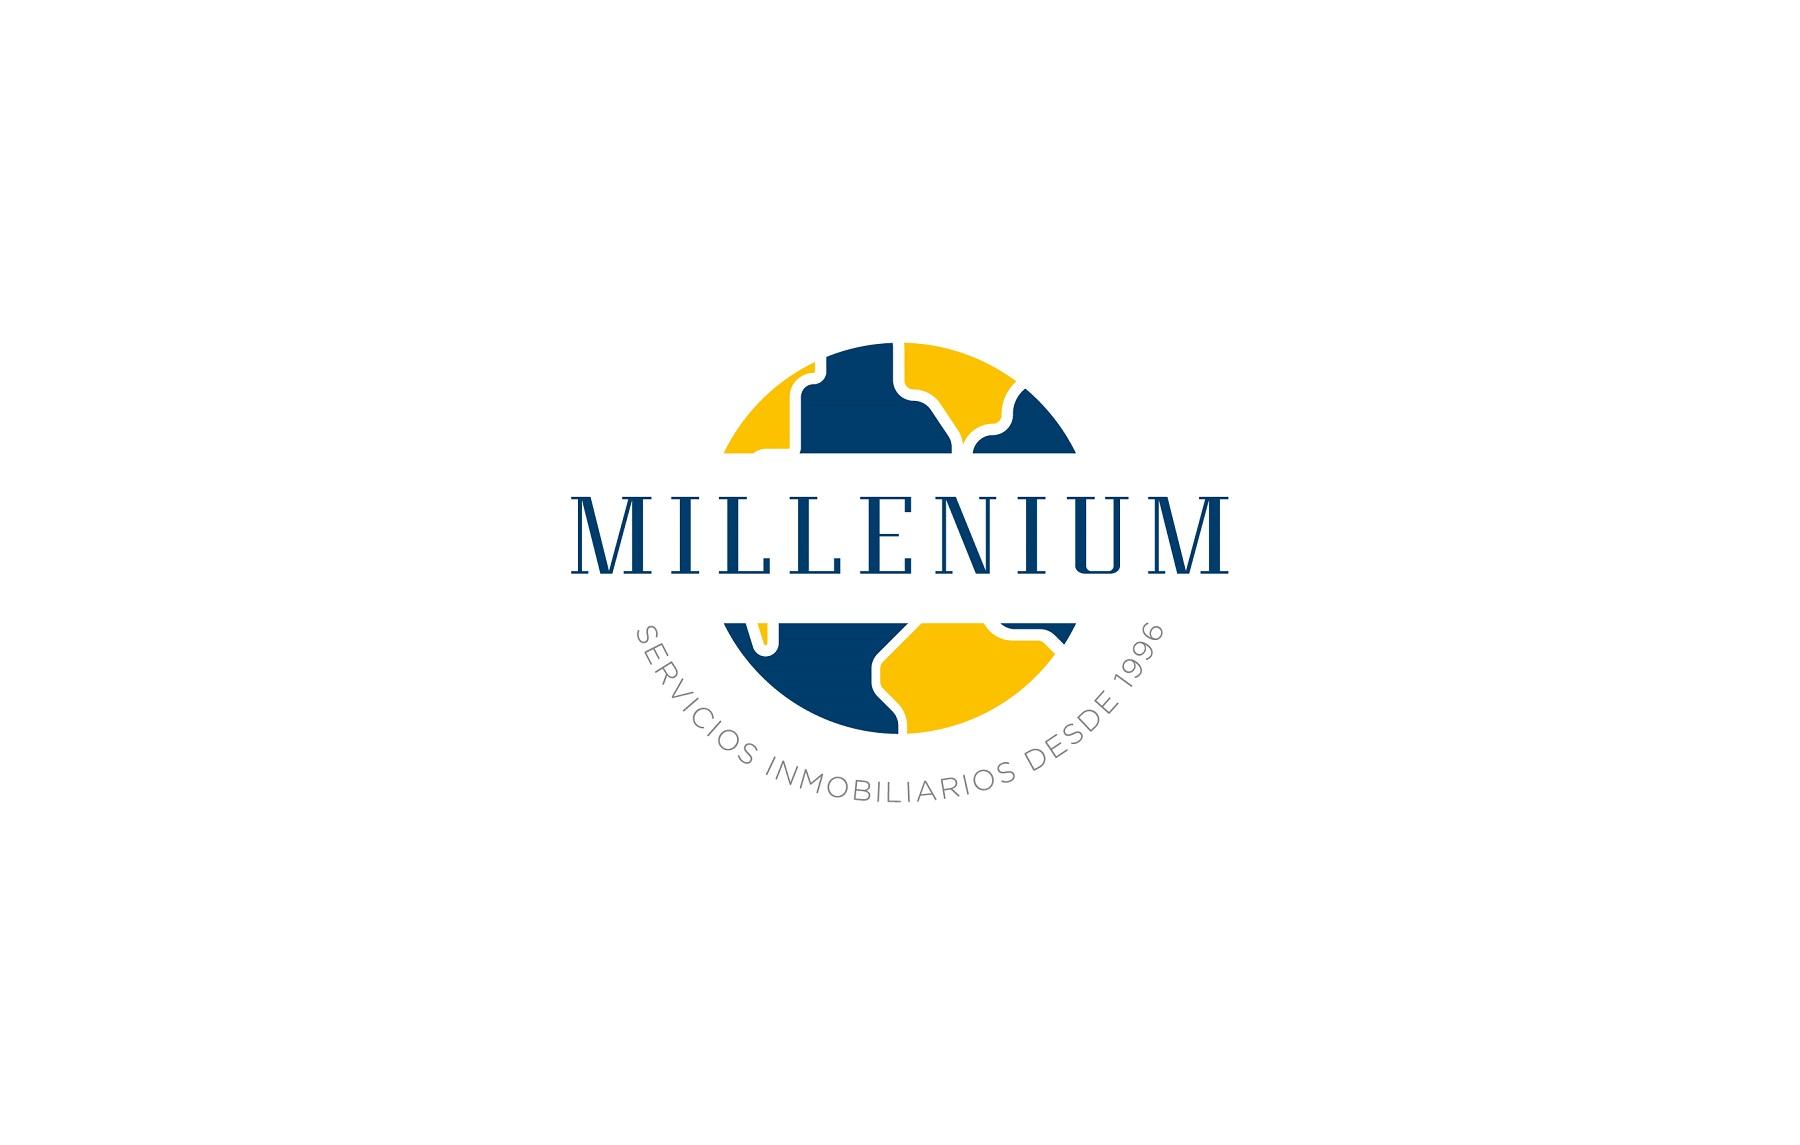 NUEVO LOGO MILLENIUM 2019.jpg2_3.jpg